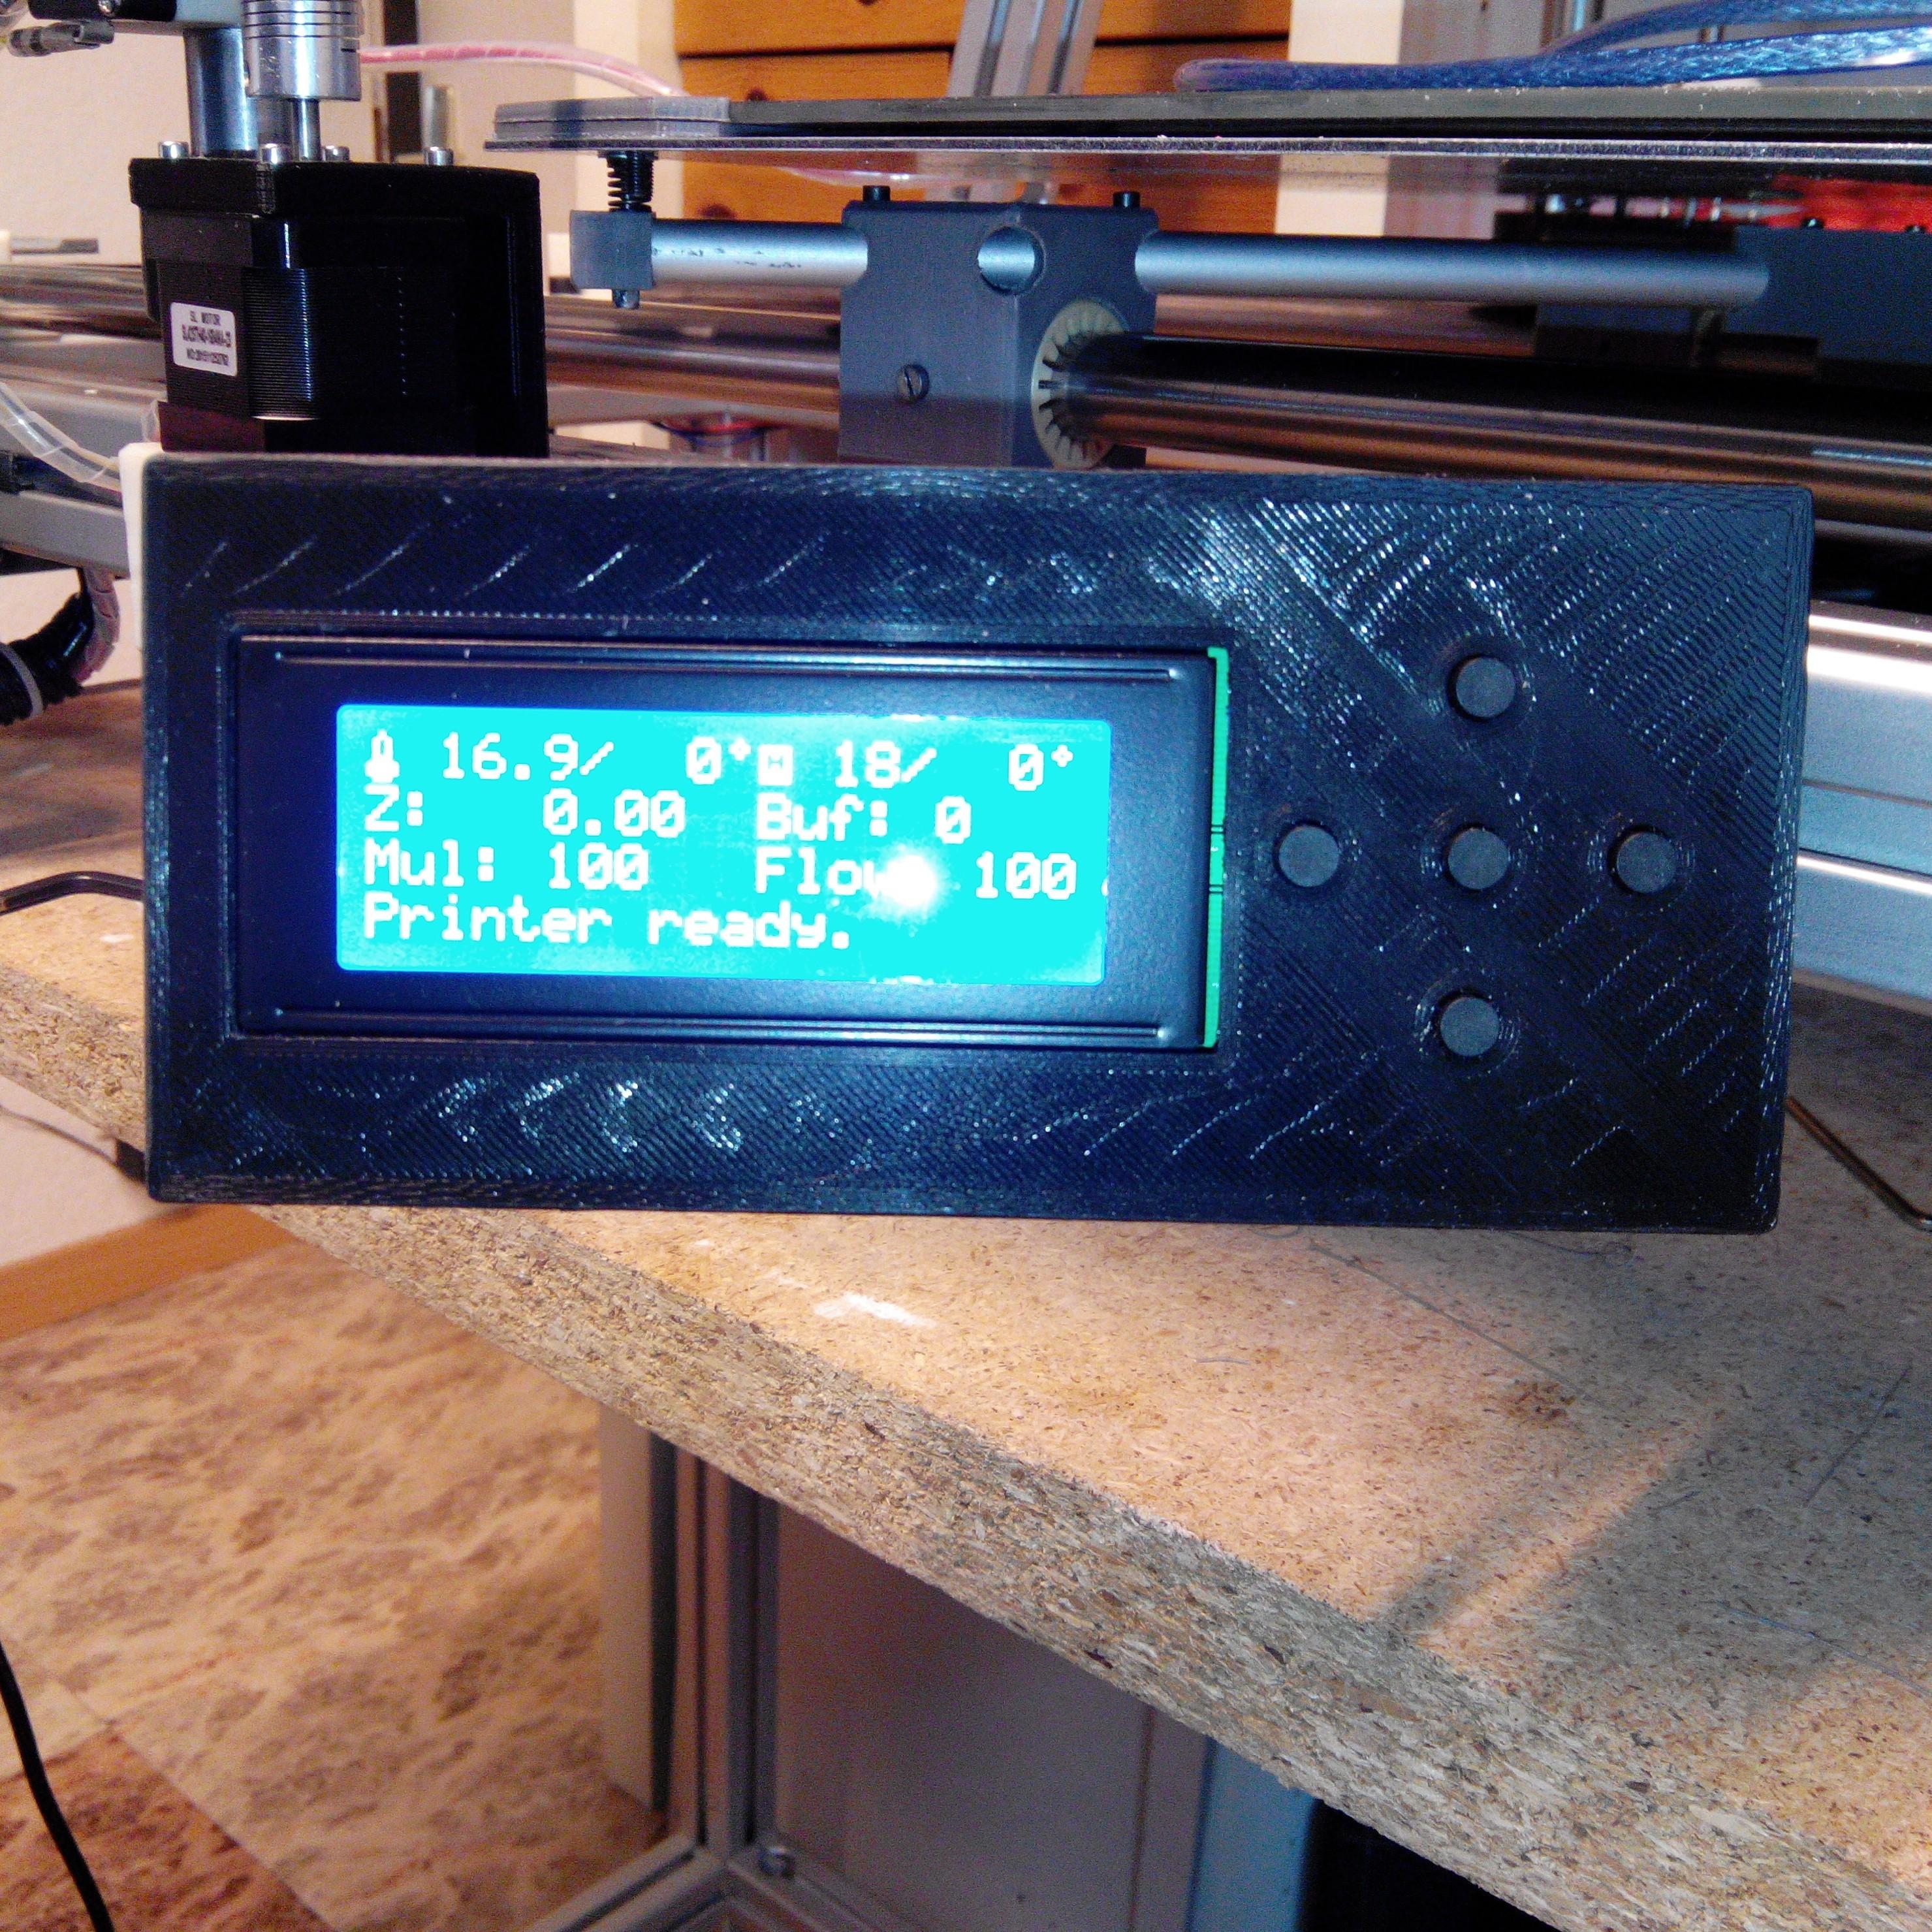 boitier face avant.JPG Download free STL file Display case Prusa I3 • 3D printer model, Alienmaker